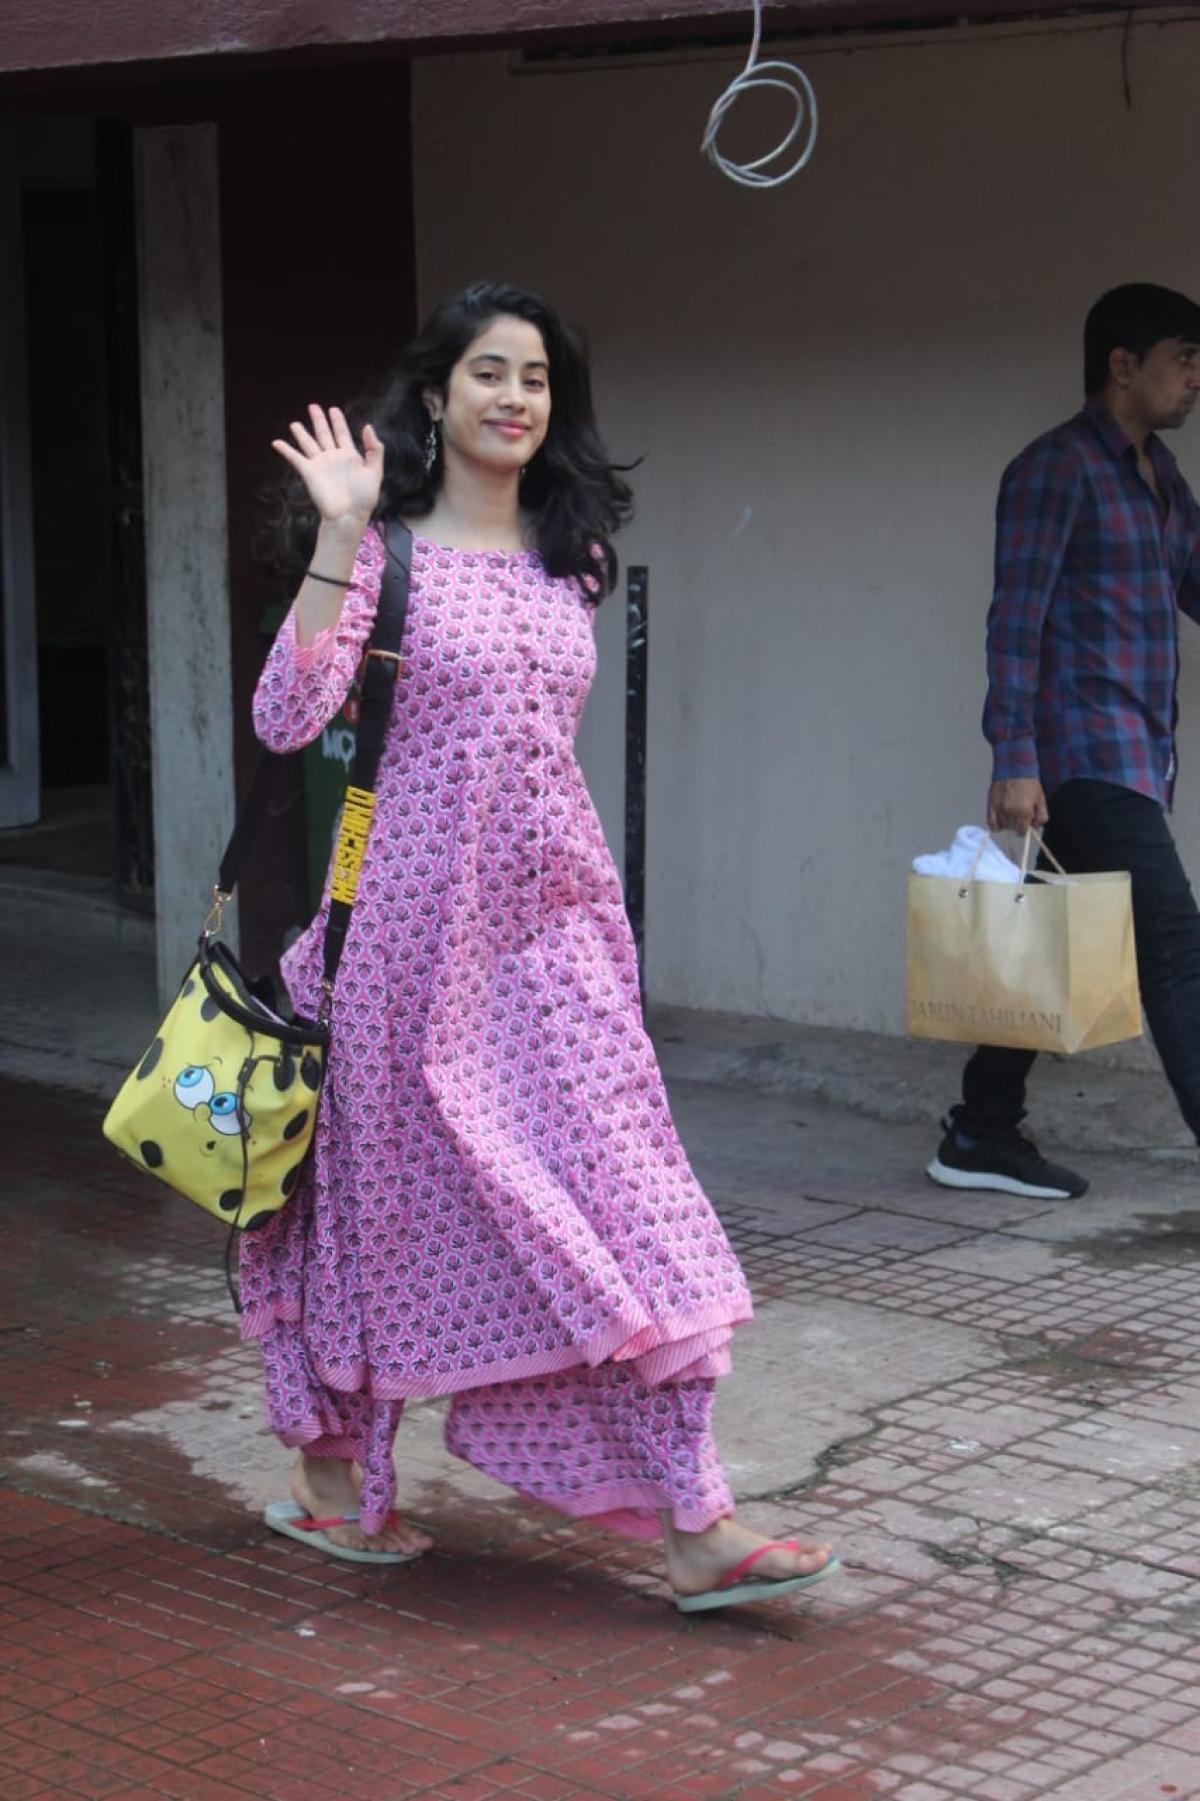 Janhvi Kapoor was seen at Pilates in Bandra.